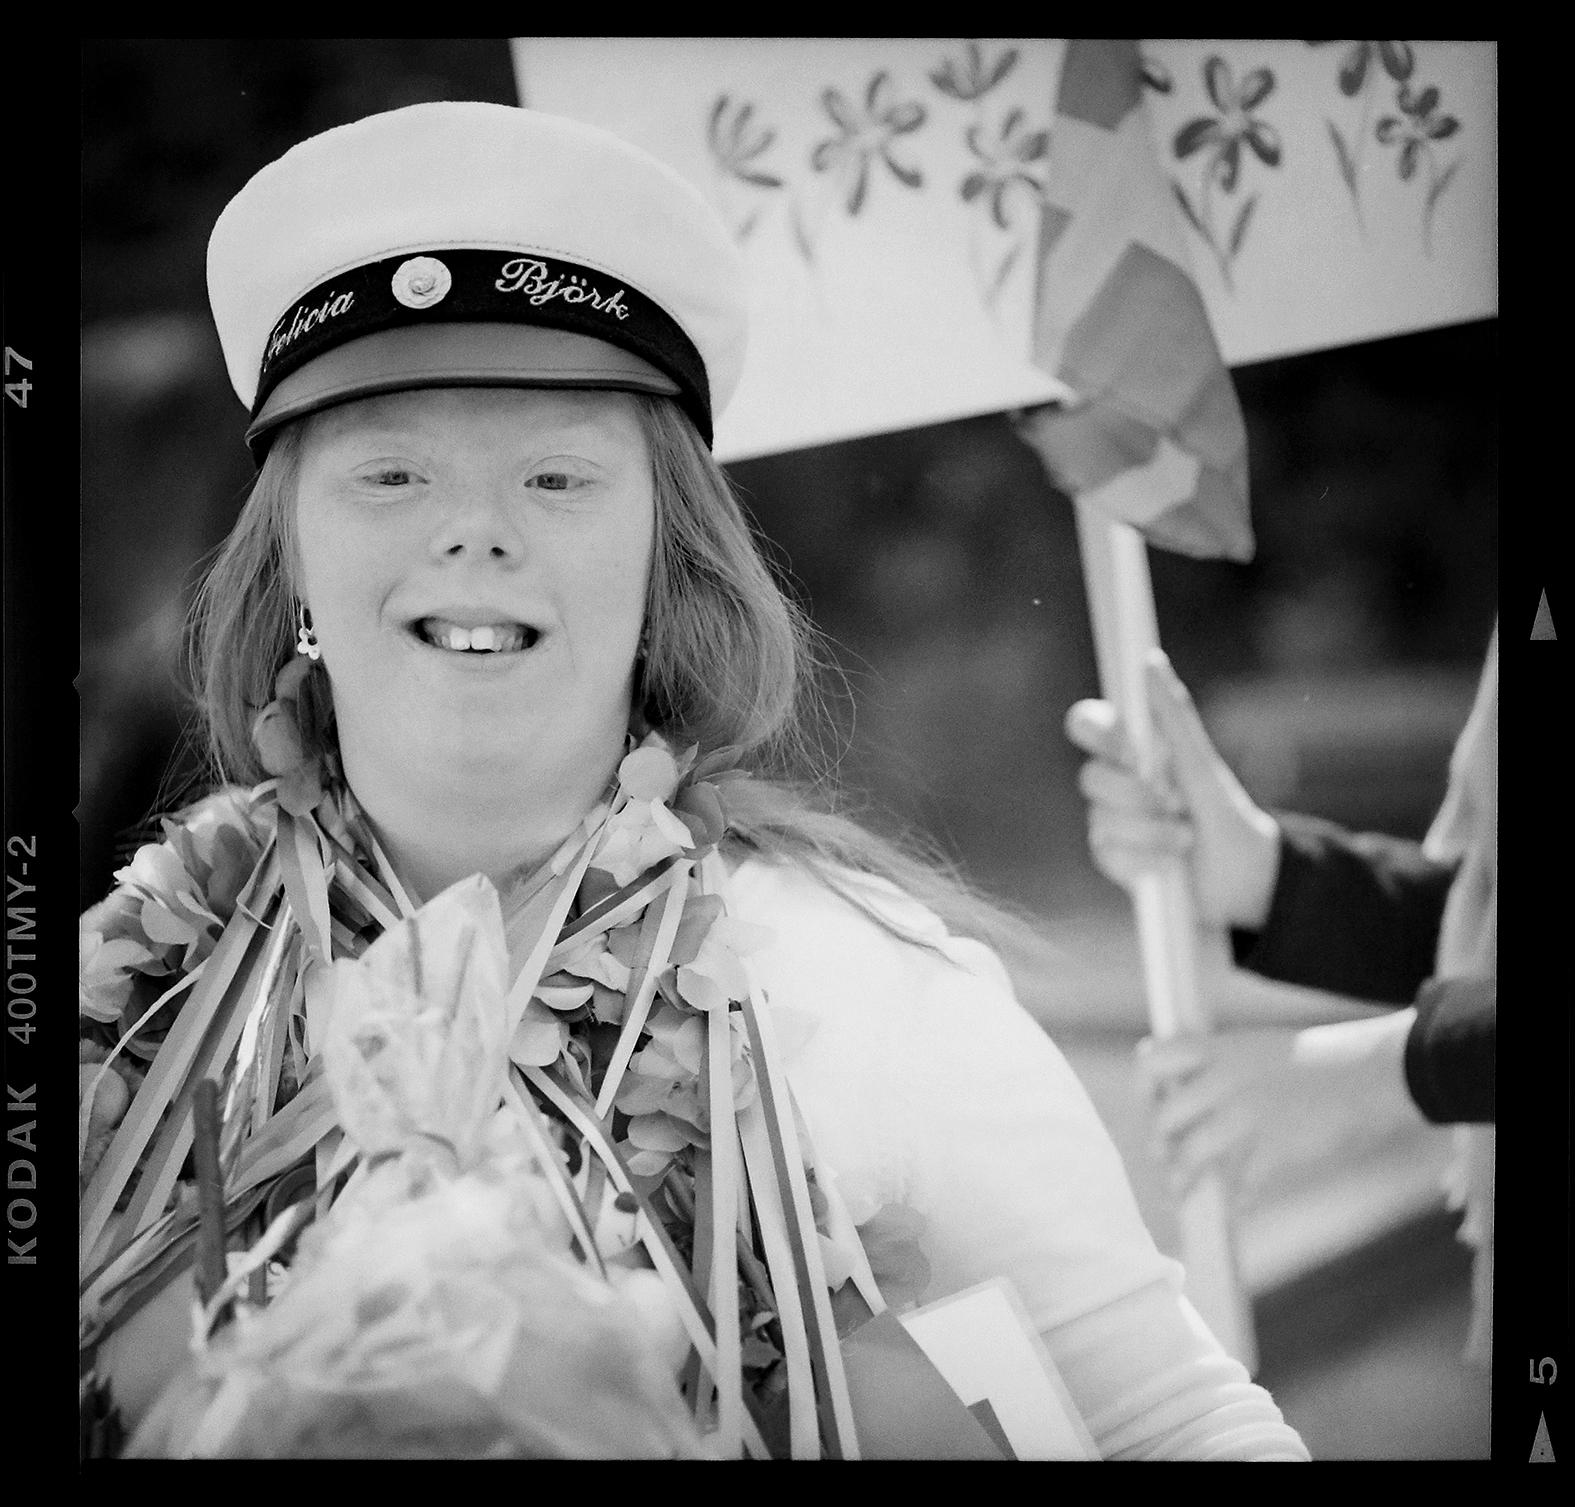 Felicia Björk var en av eleverna som tog studenten. Foto: Mikael Andersson, 2016-06-09, Hasselblad 500 CM, 140mm, f4-1/500sek.